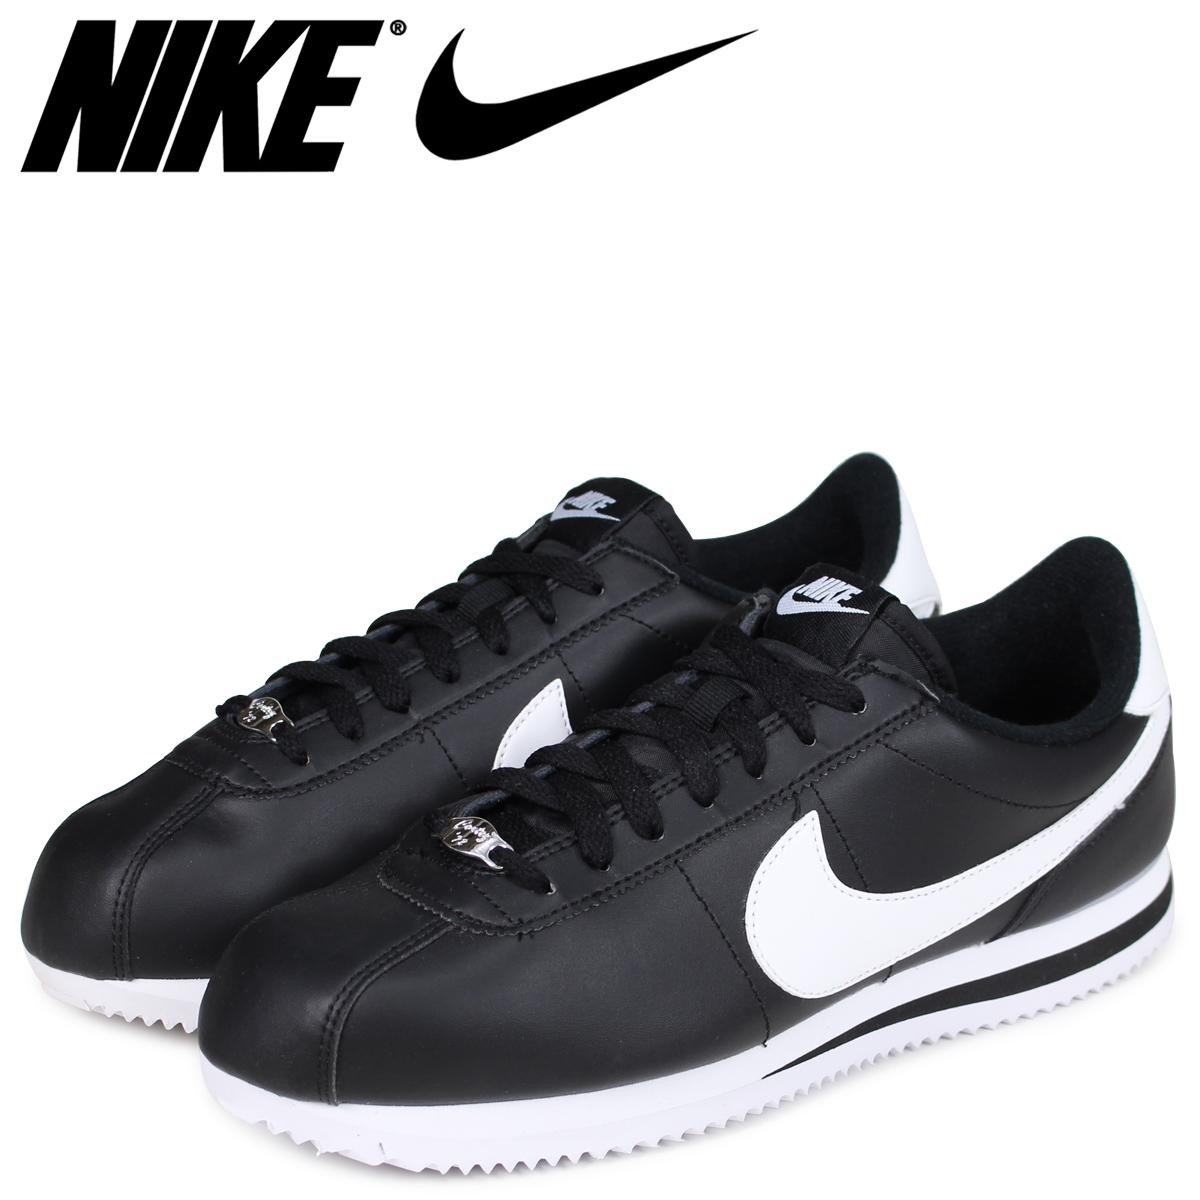 d186f6efff13 Nike NIKE Cortez sneakers CORTEZ BASIC LEATHER 819719-012 mens shoes black